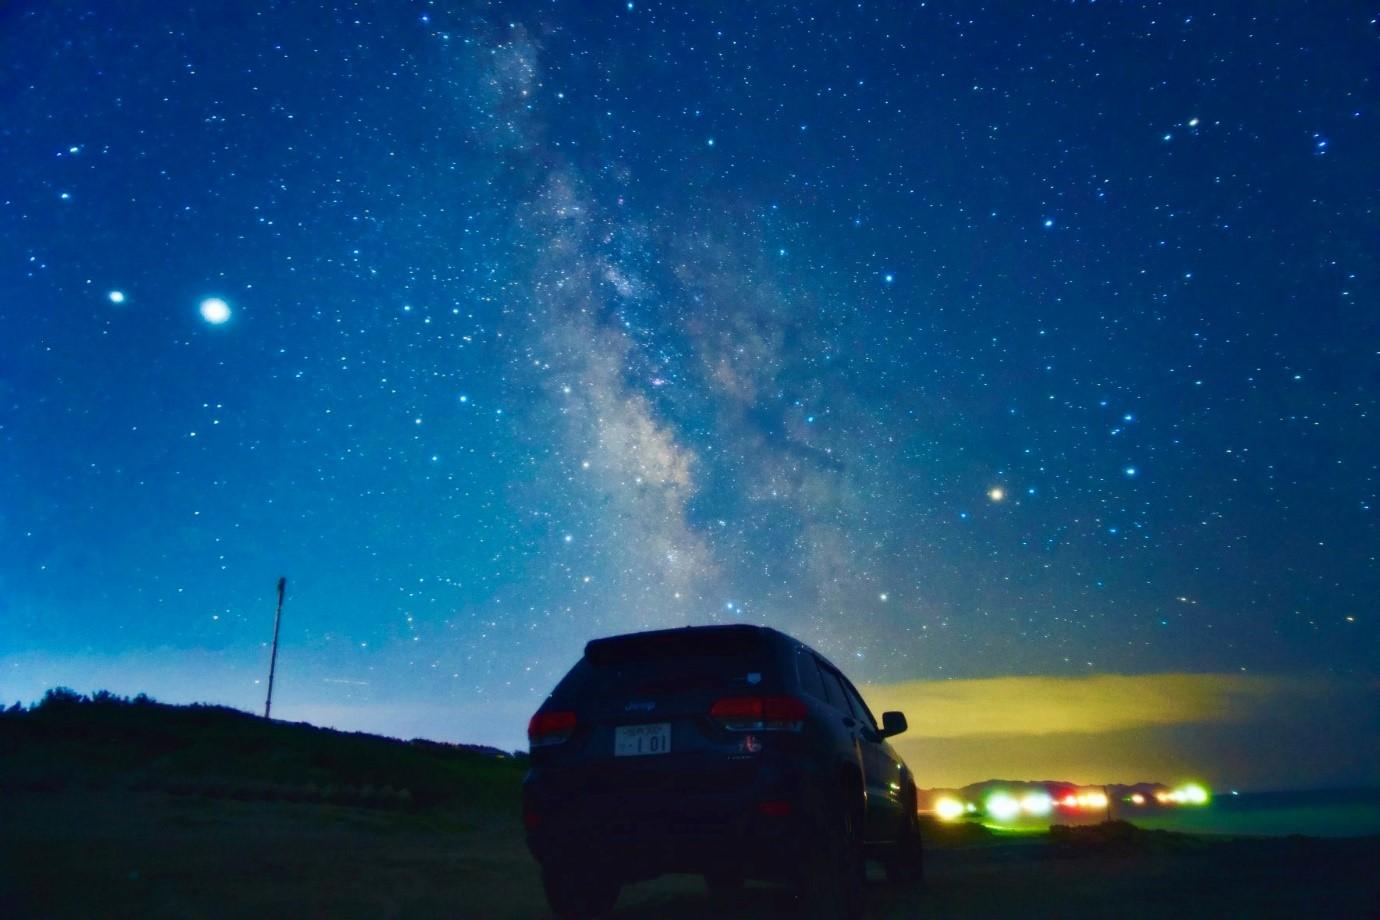 鳥海山の星空